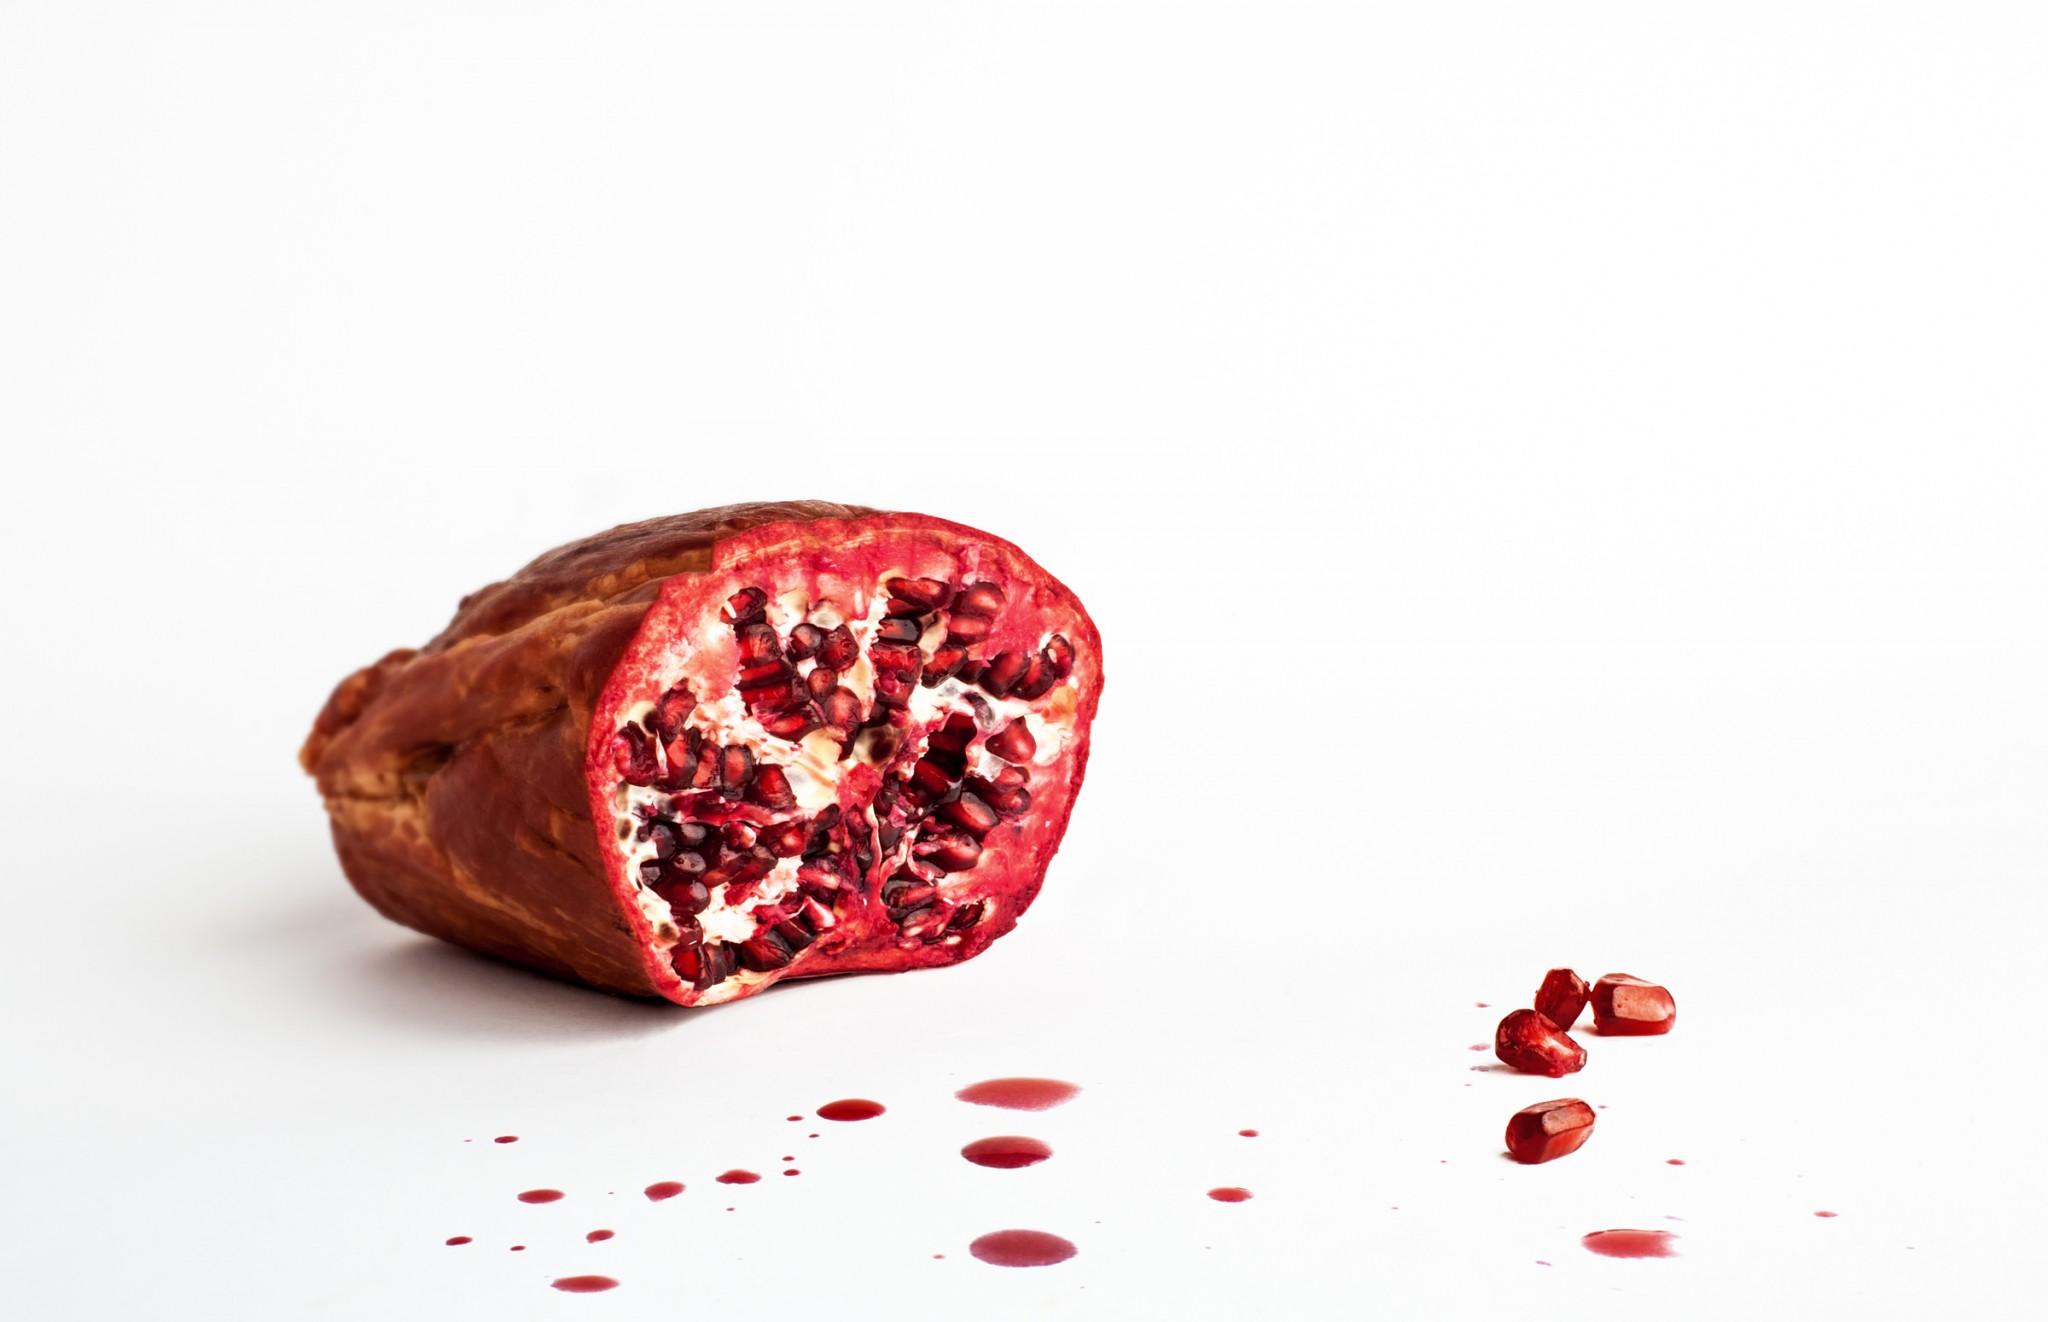 Pulp - kassler and pomegranate